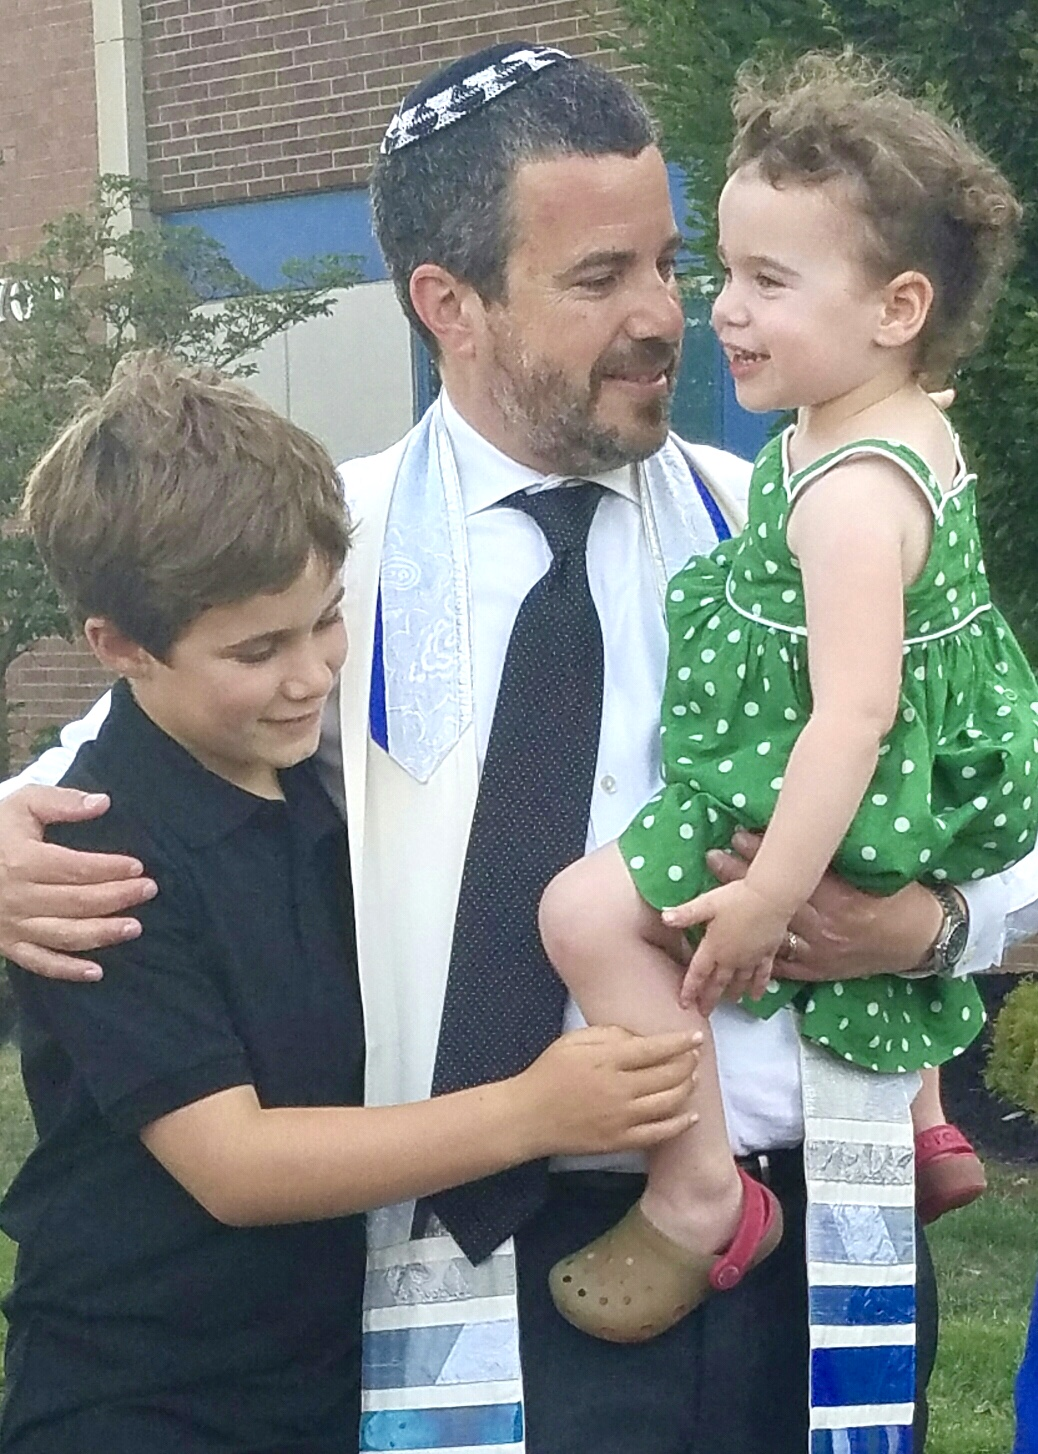 Rabbi Jonathan Freirich, Jude & Sadie, Summer 2016